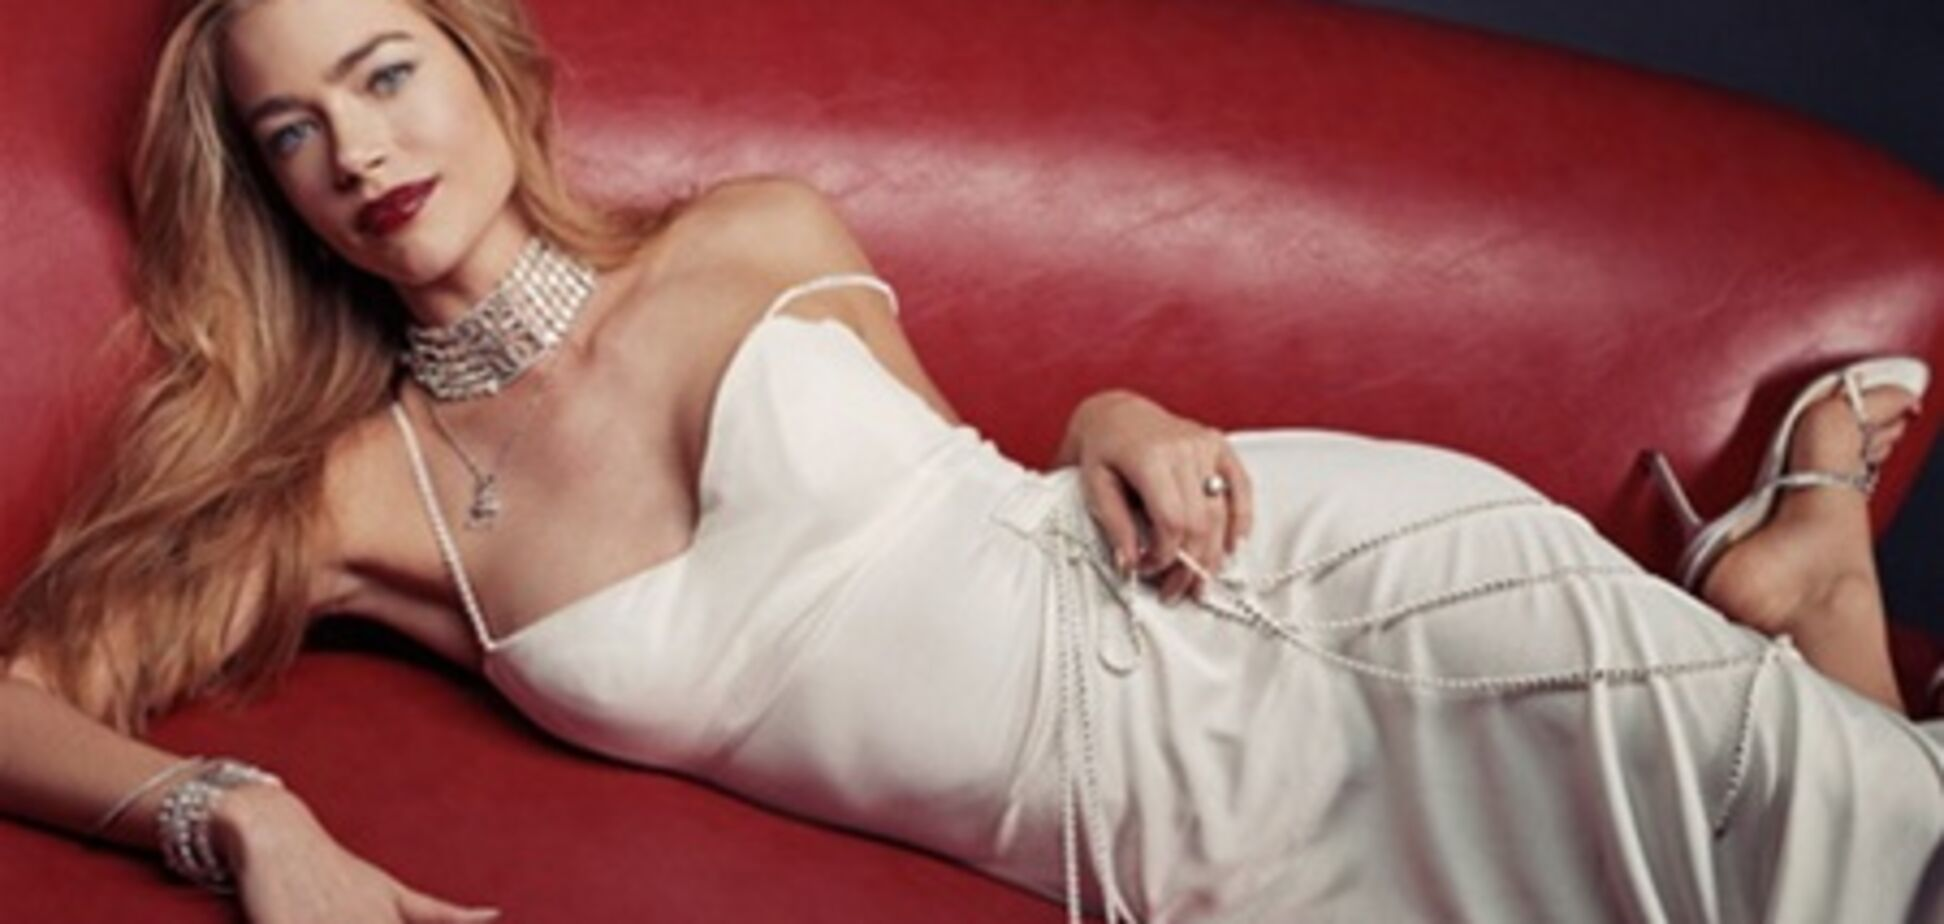 Экс-жена Чарли Шина в вечерних платьях и бриллиантах